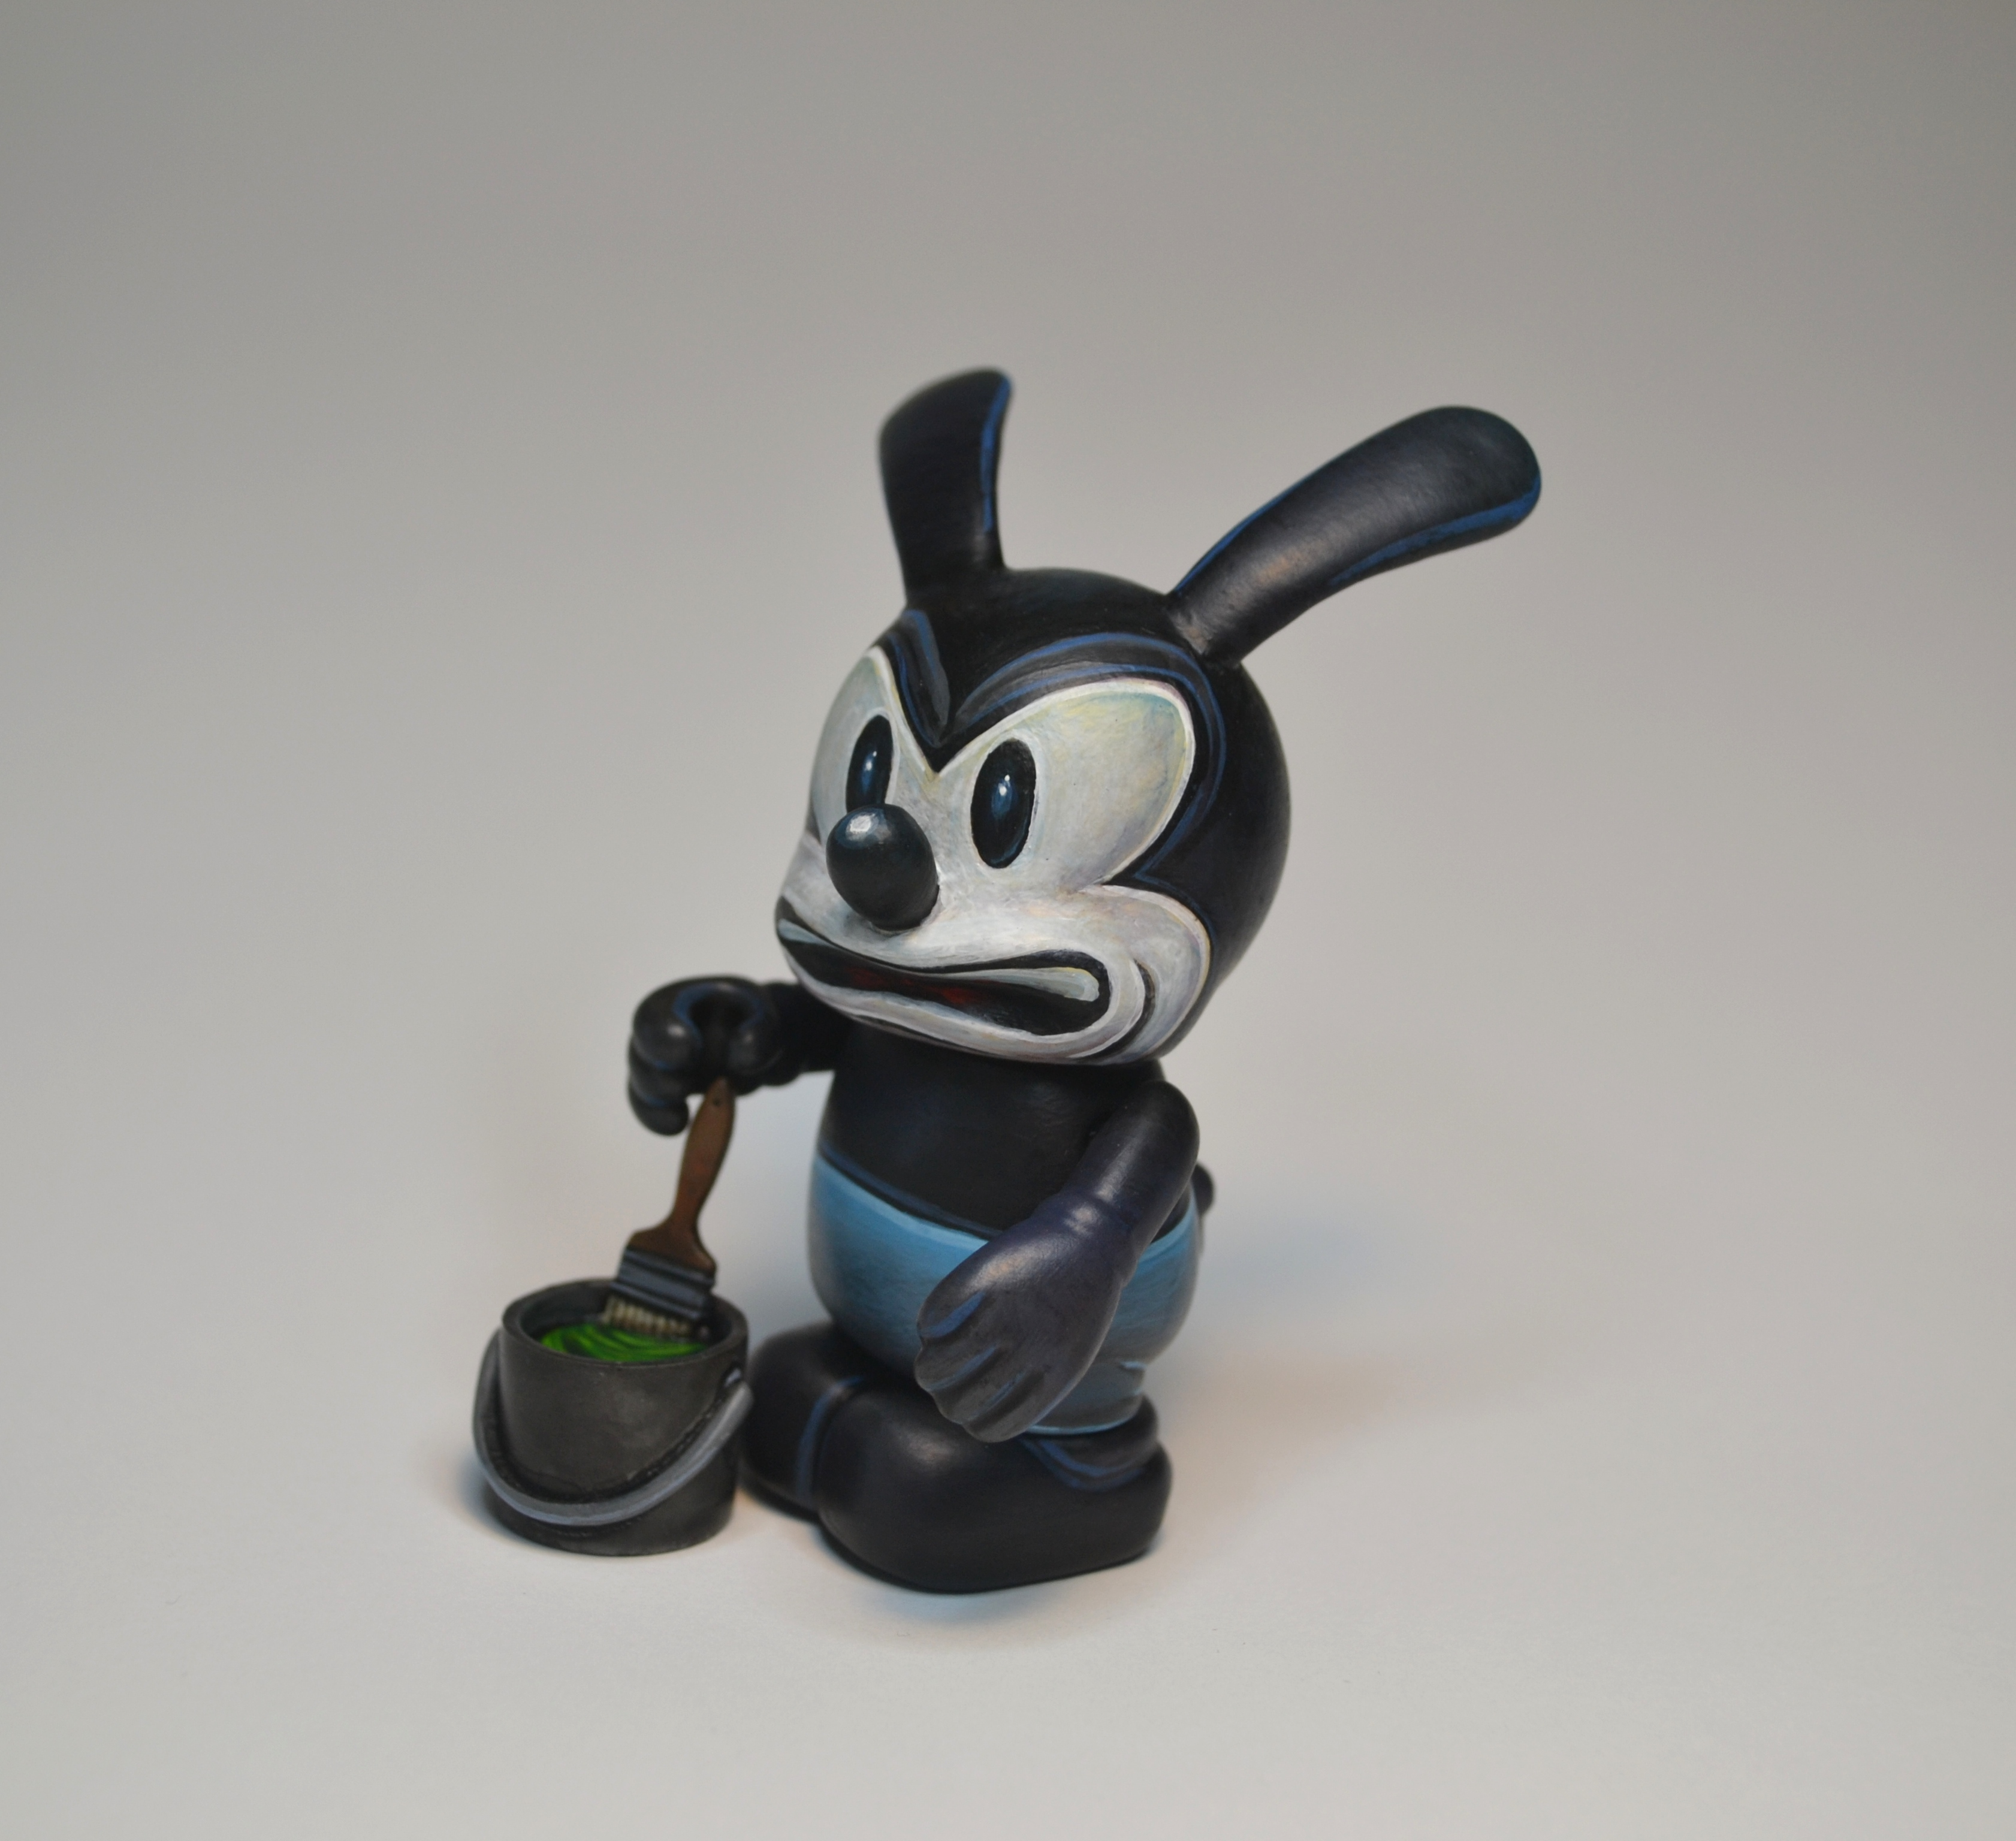 Angry Oswald